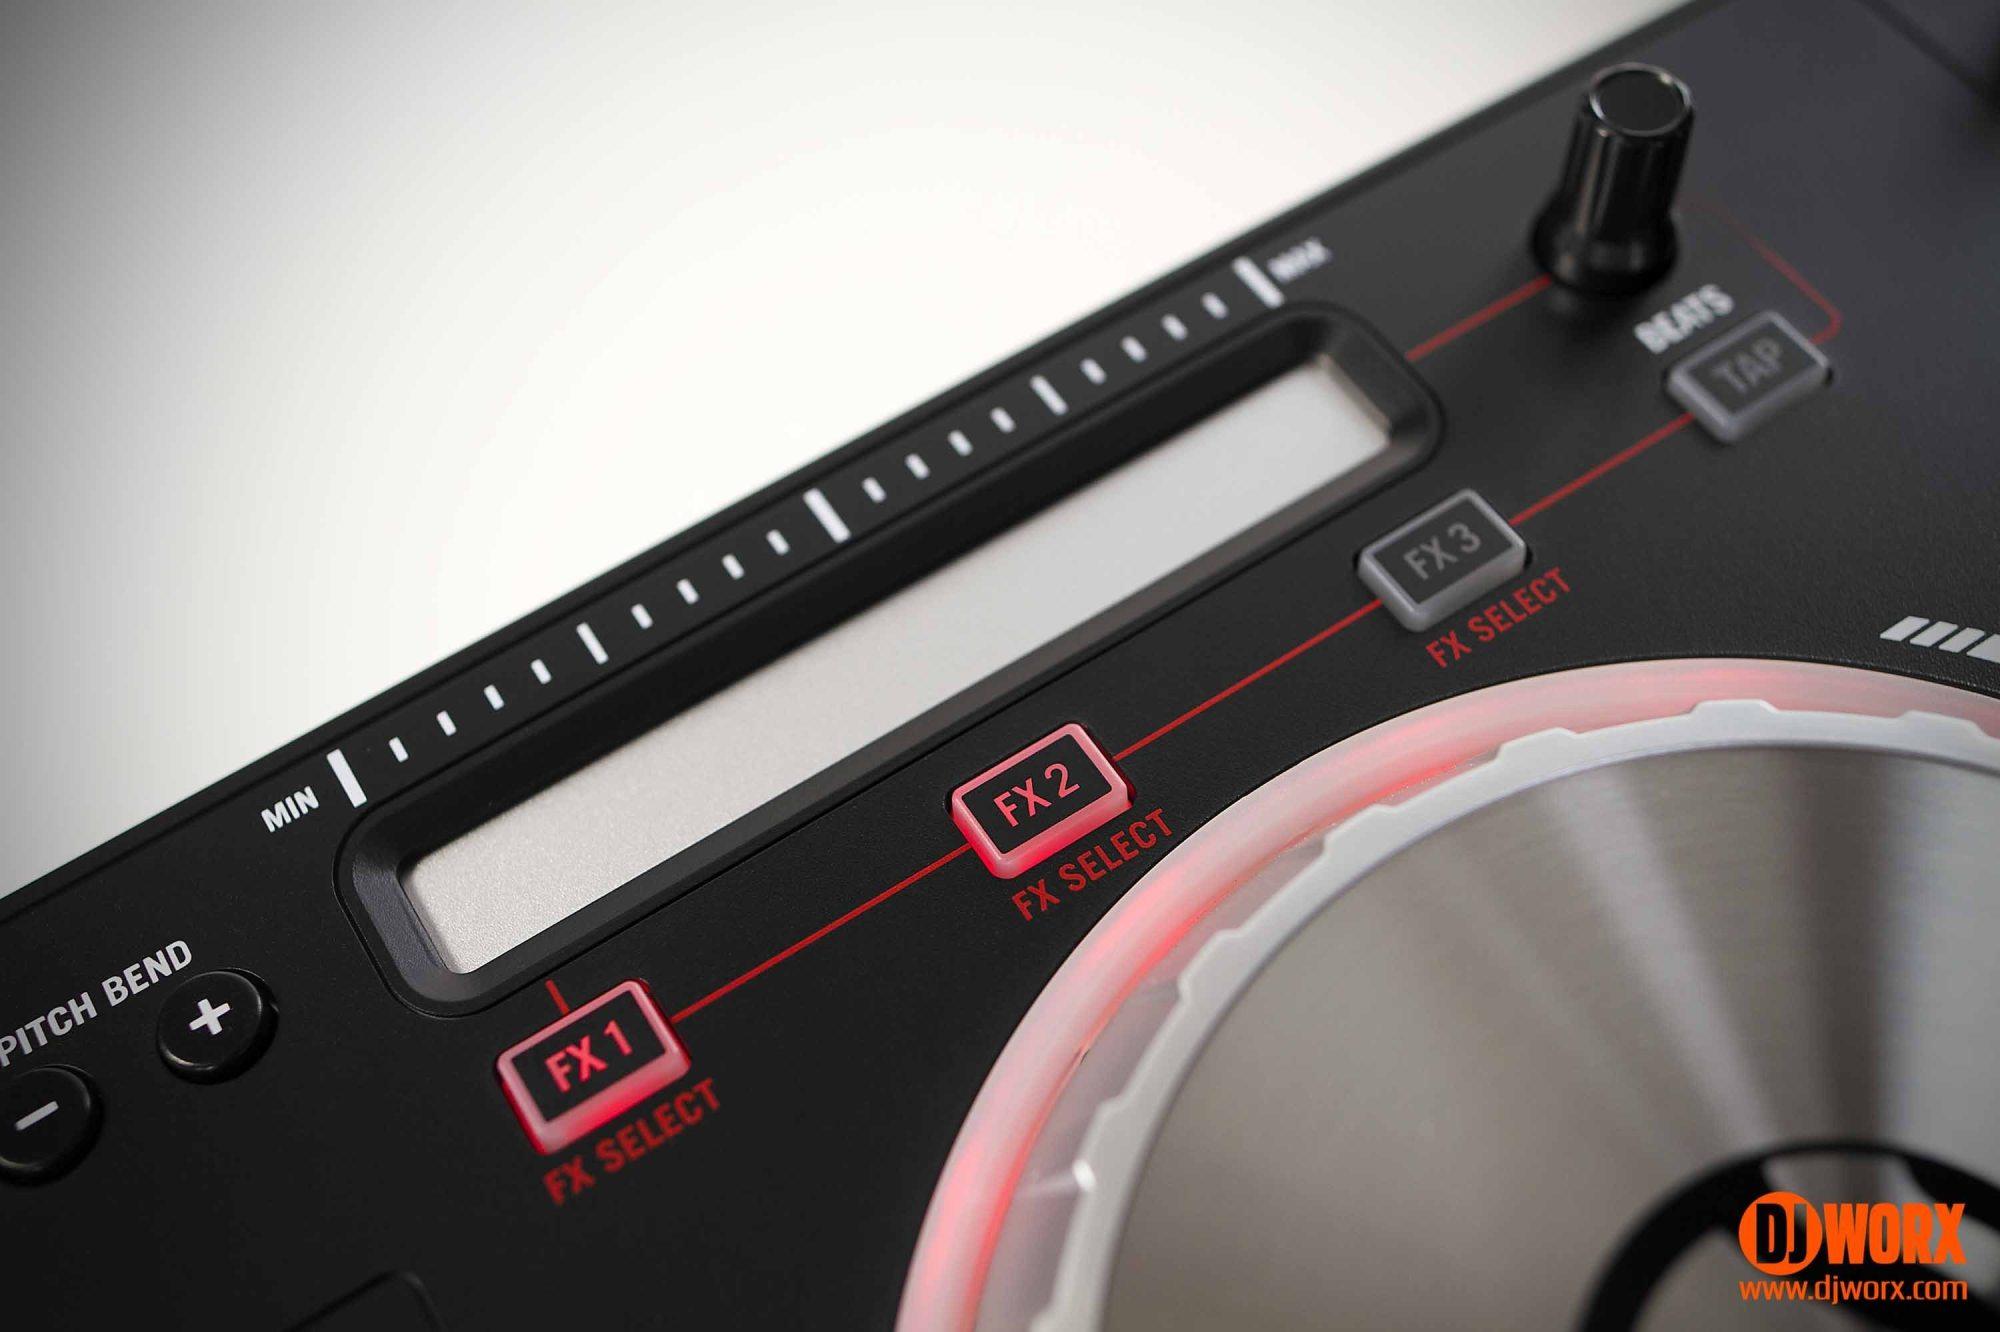 hight resolution of numark mixtrack pro 3 serato dj intro controller review 4